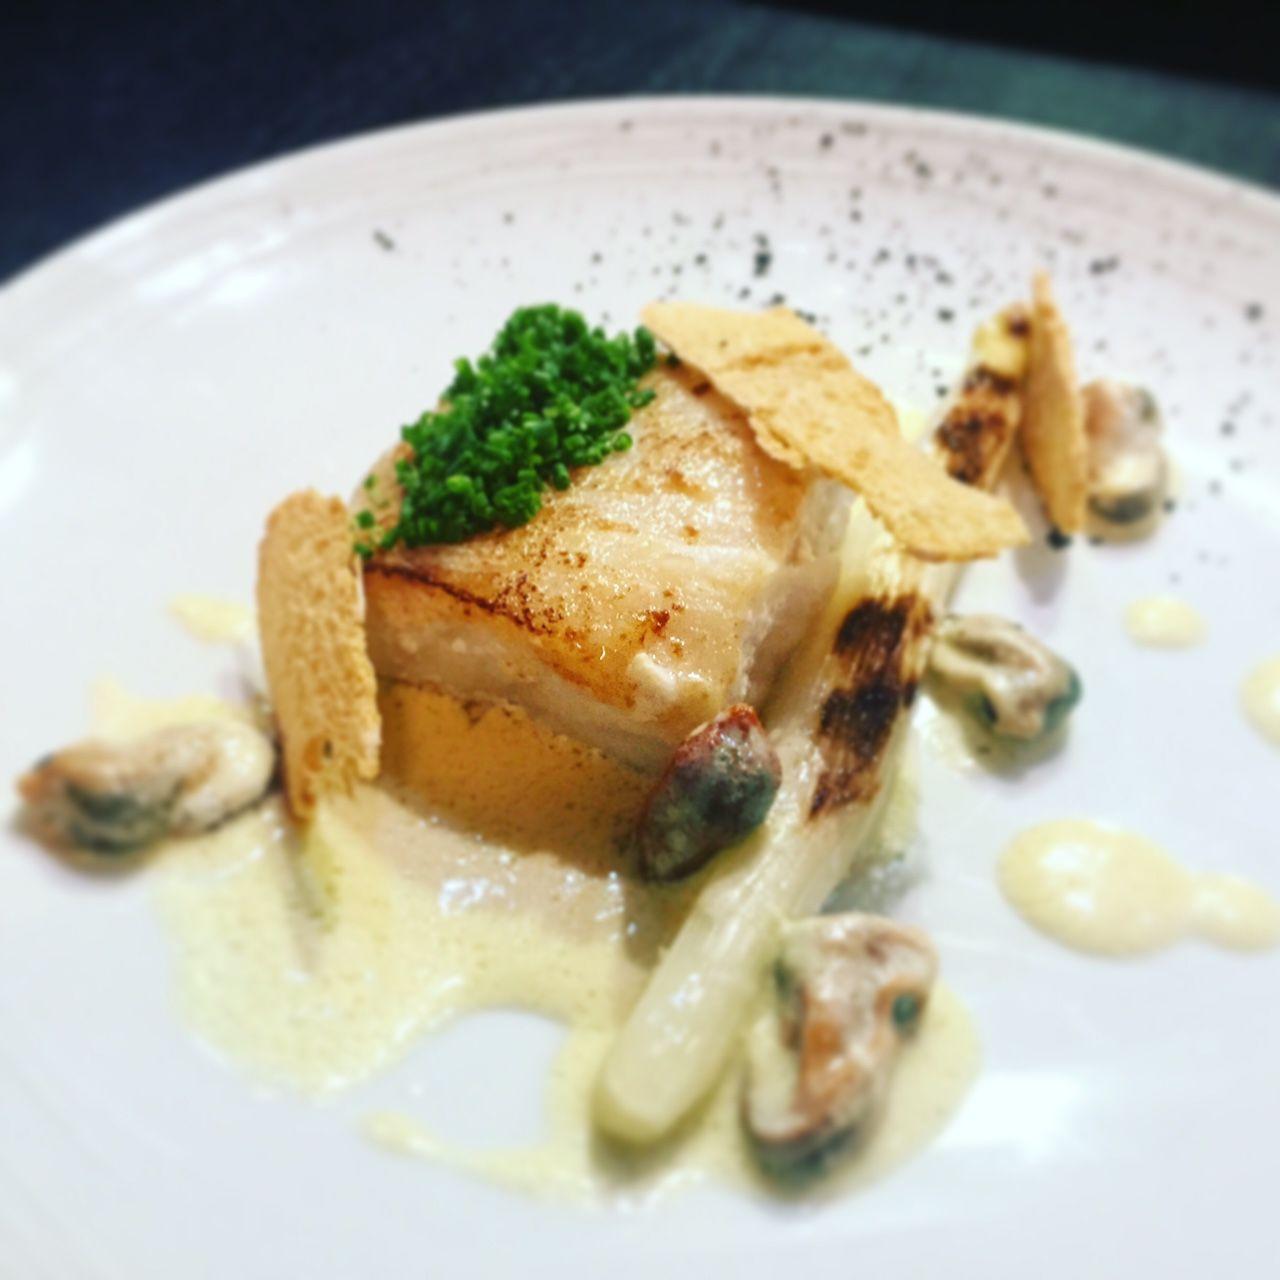 Elegant Dinner Party Menu Ideas Part - 42: 5 Best Elegant Dinner Party Menu Ideas From Top Private Chefs